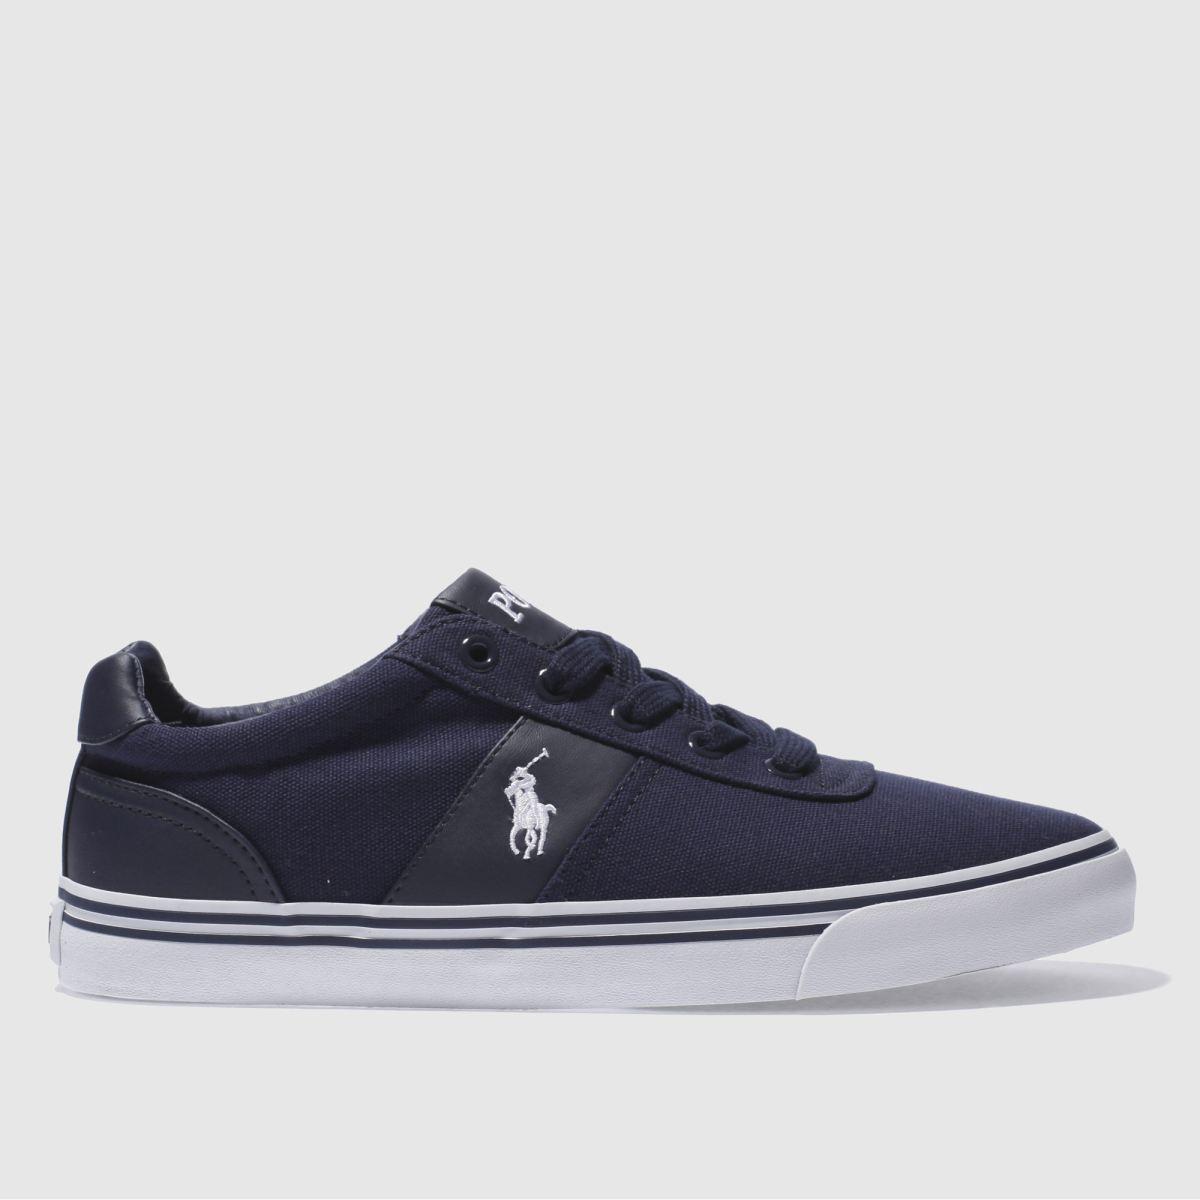 Polo Ralph Lauren Navy Hanford 2 Shoes